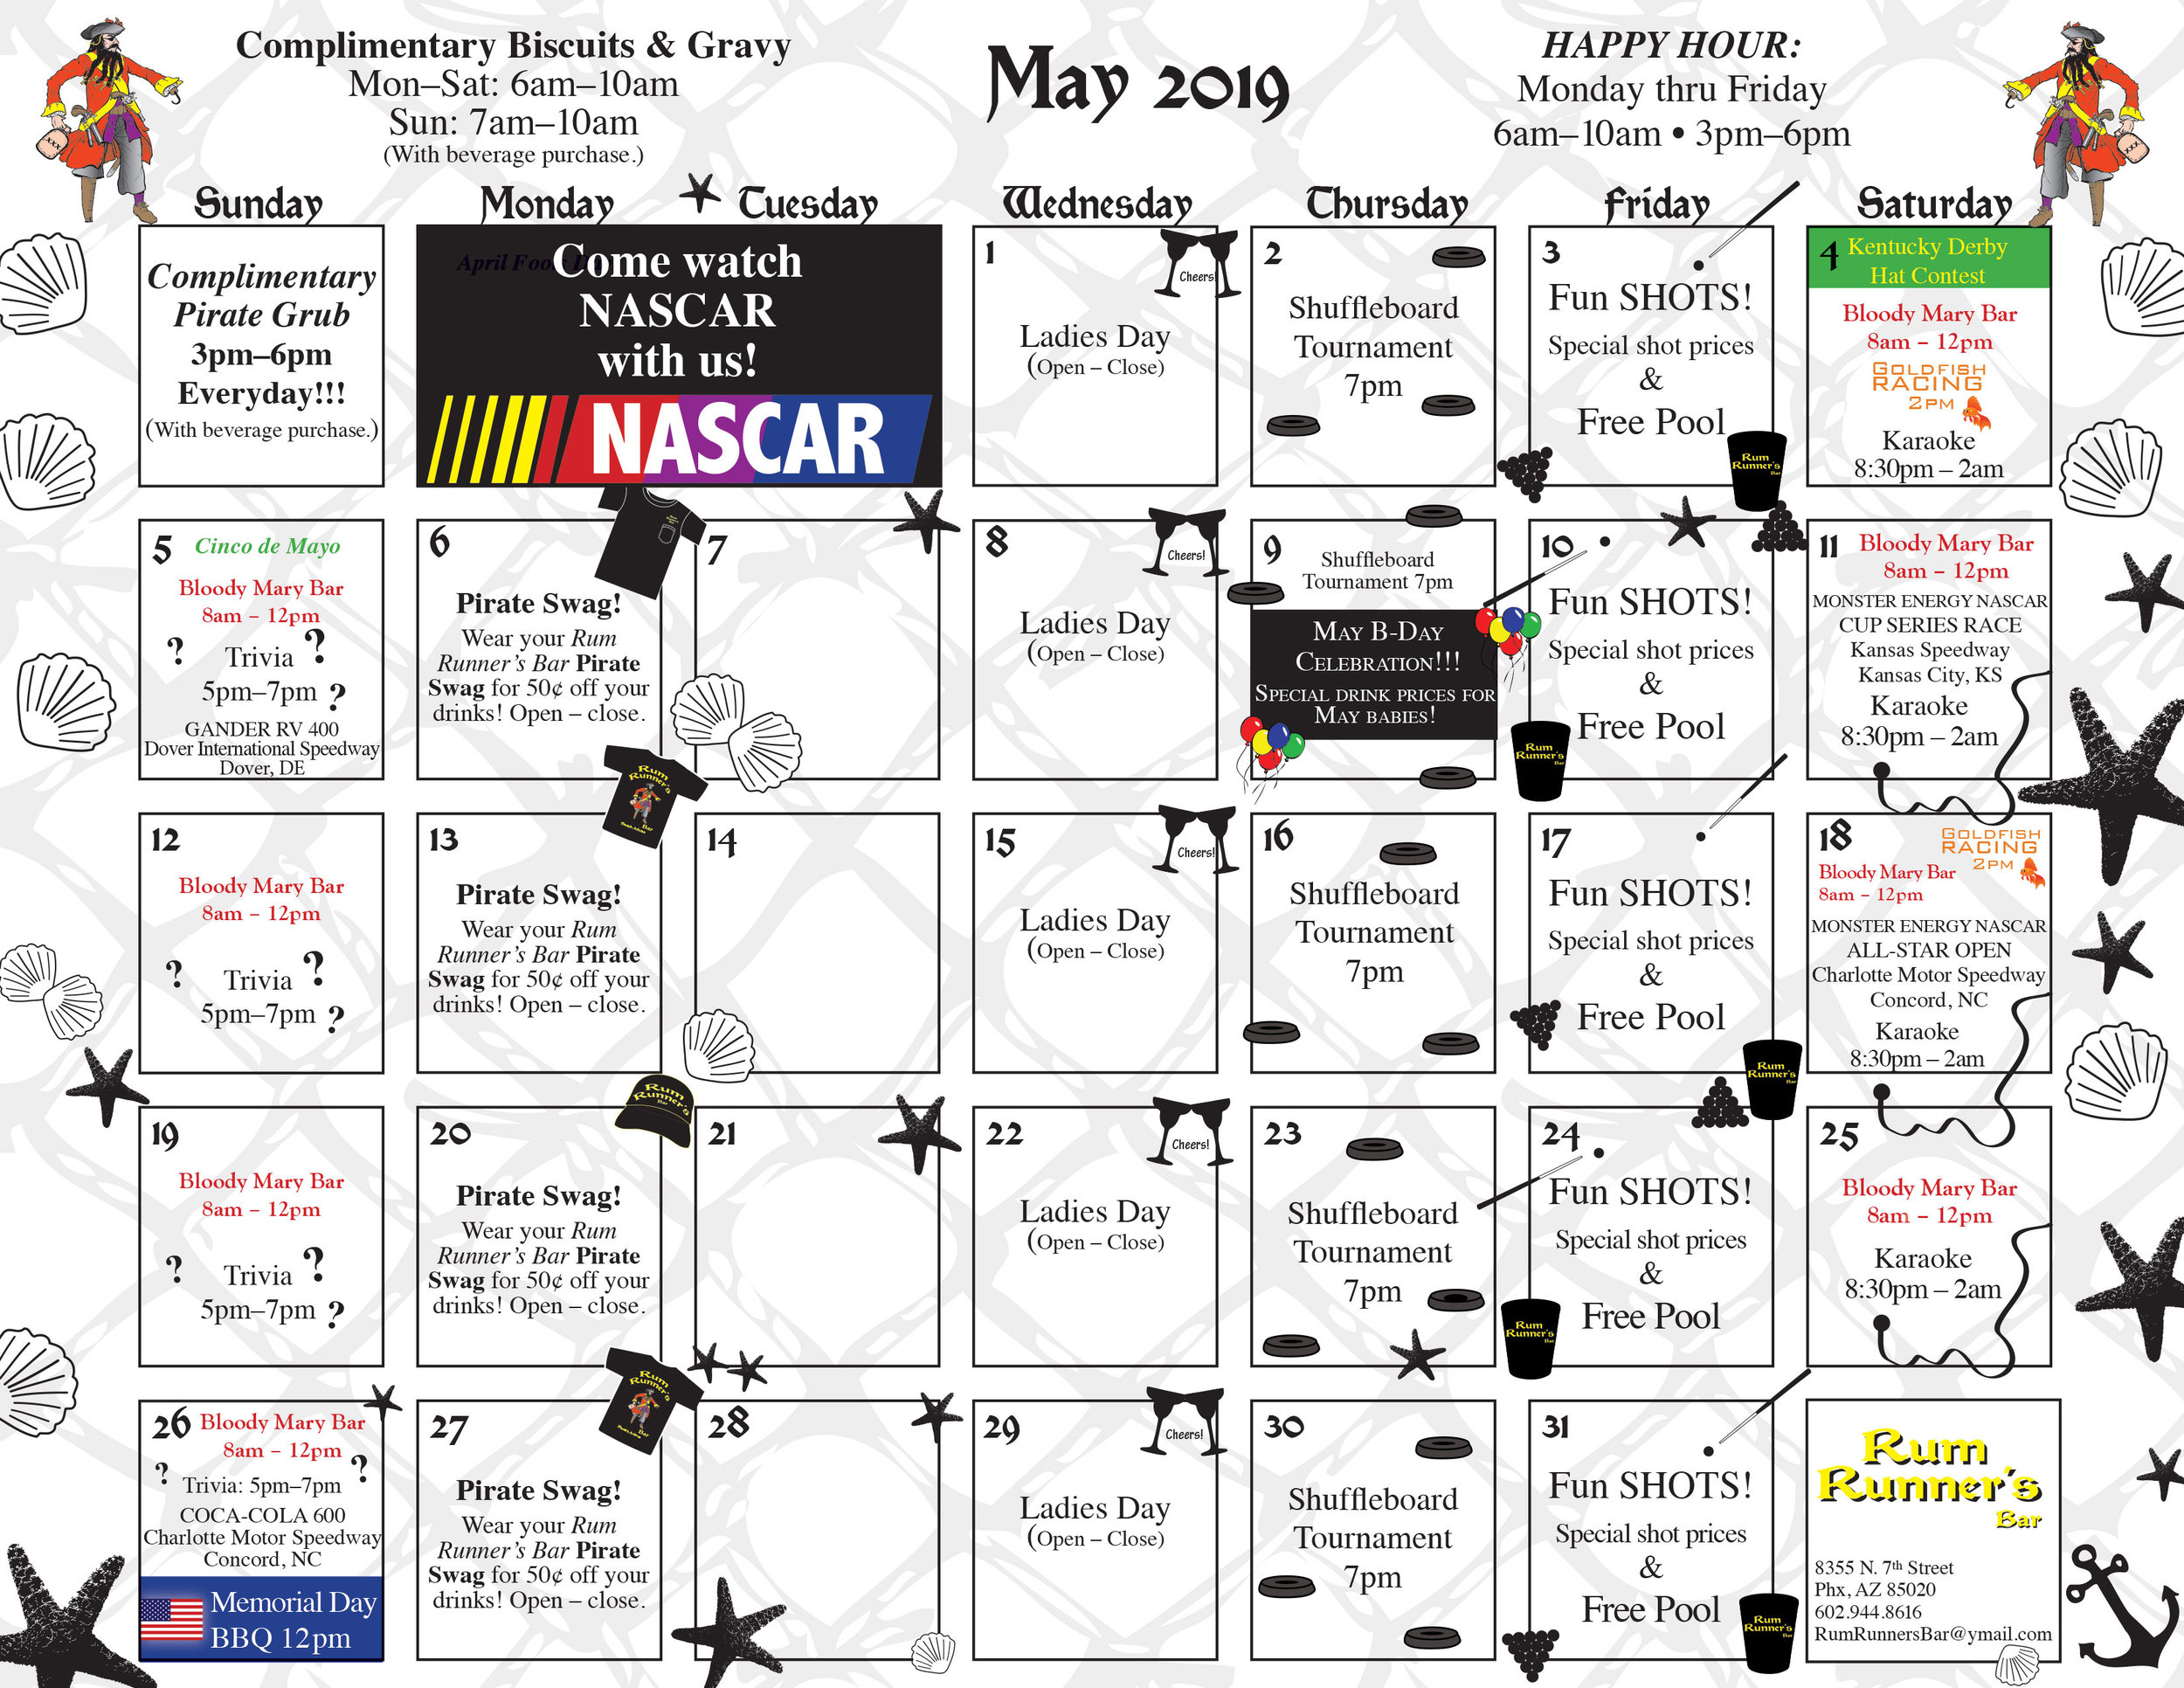 RRBar_Calendar_05_May_2019-web.jpg